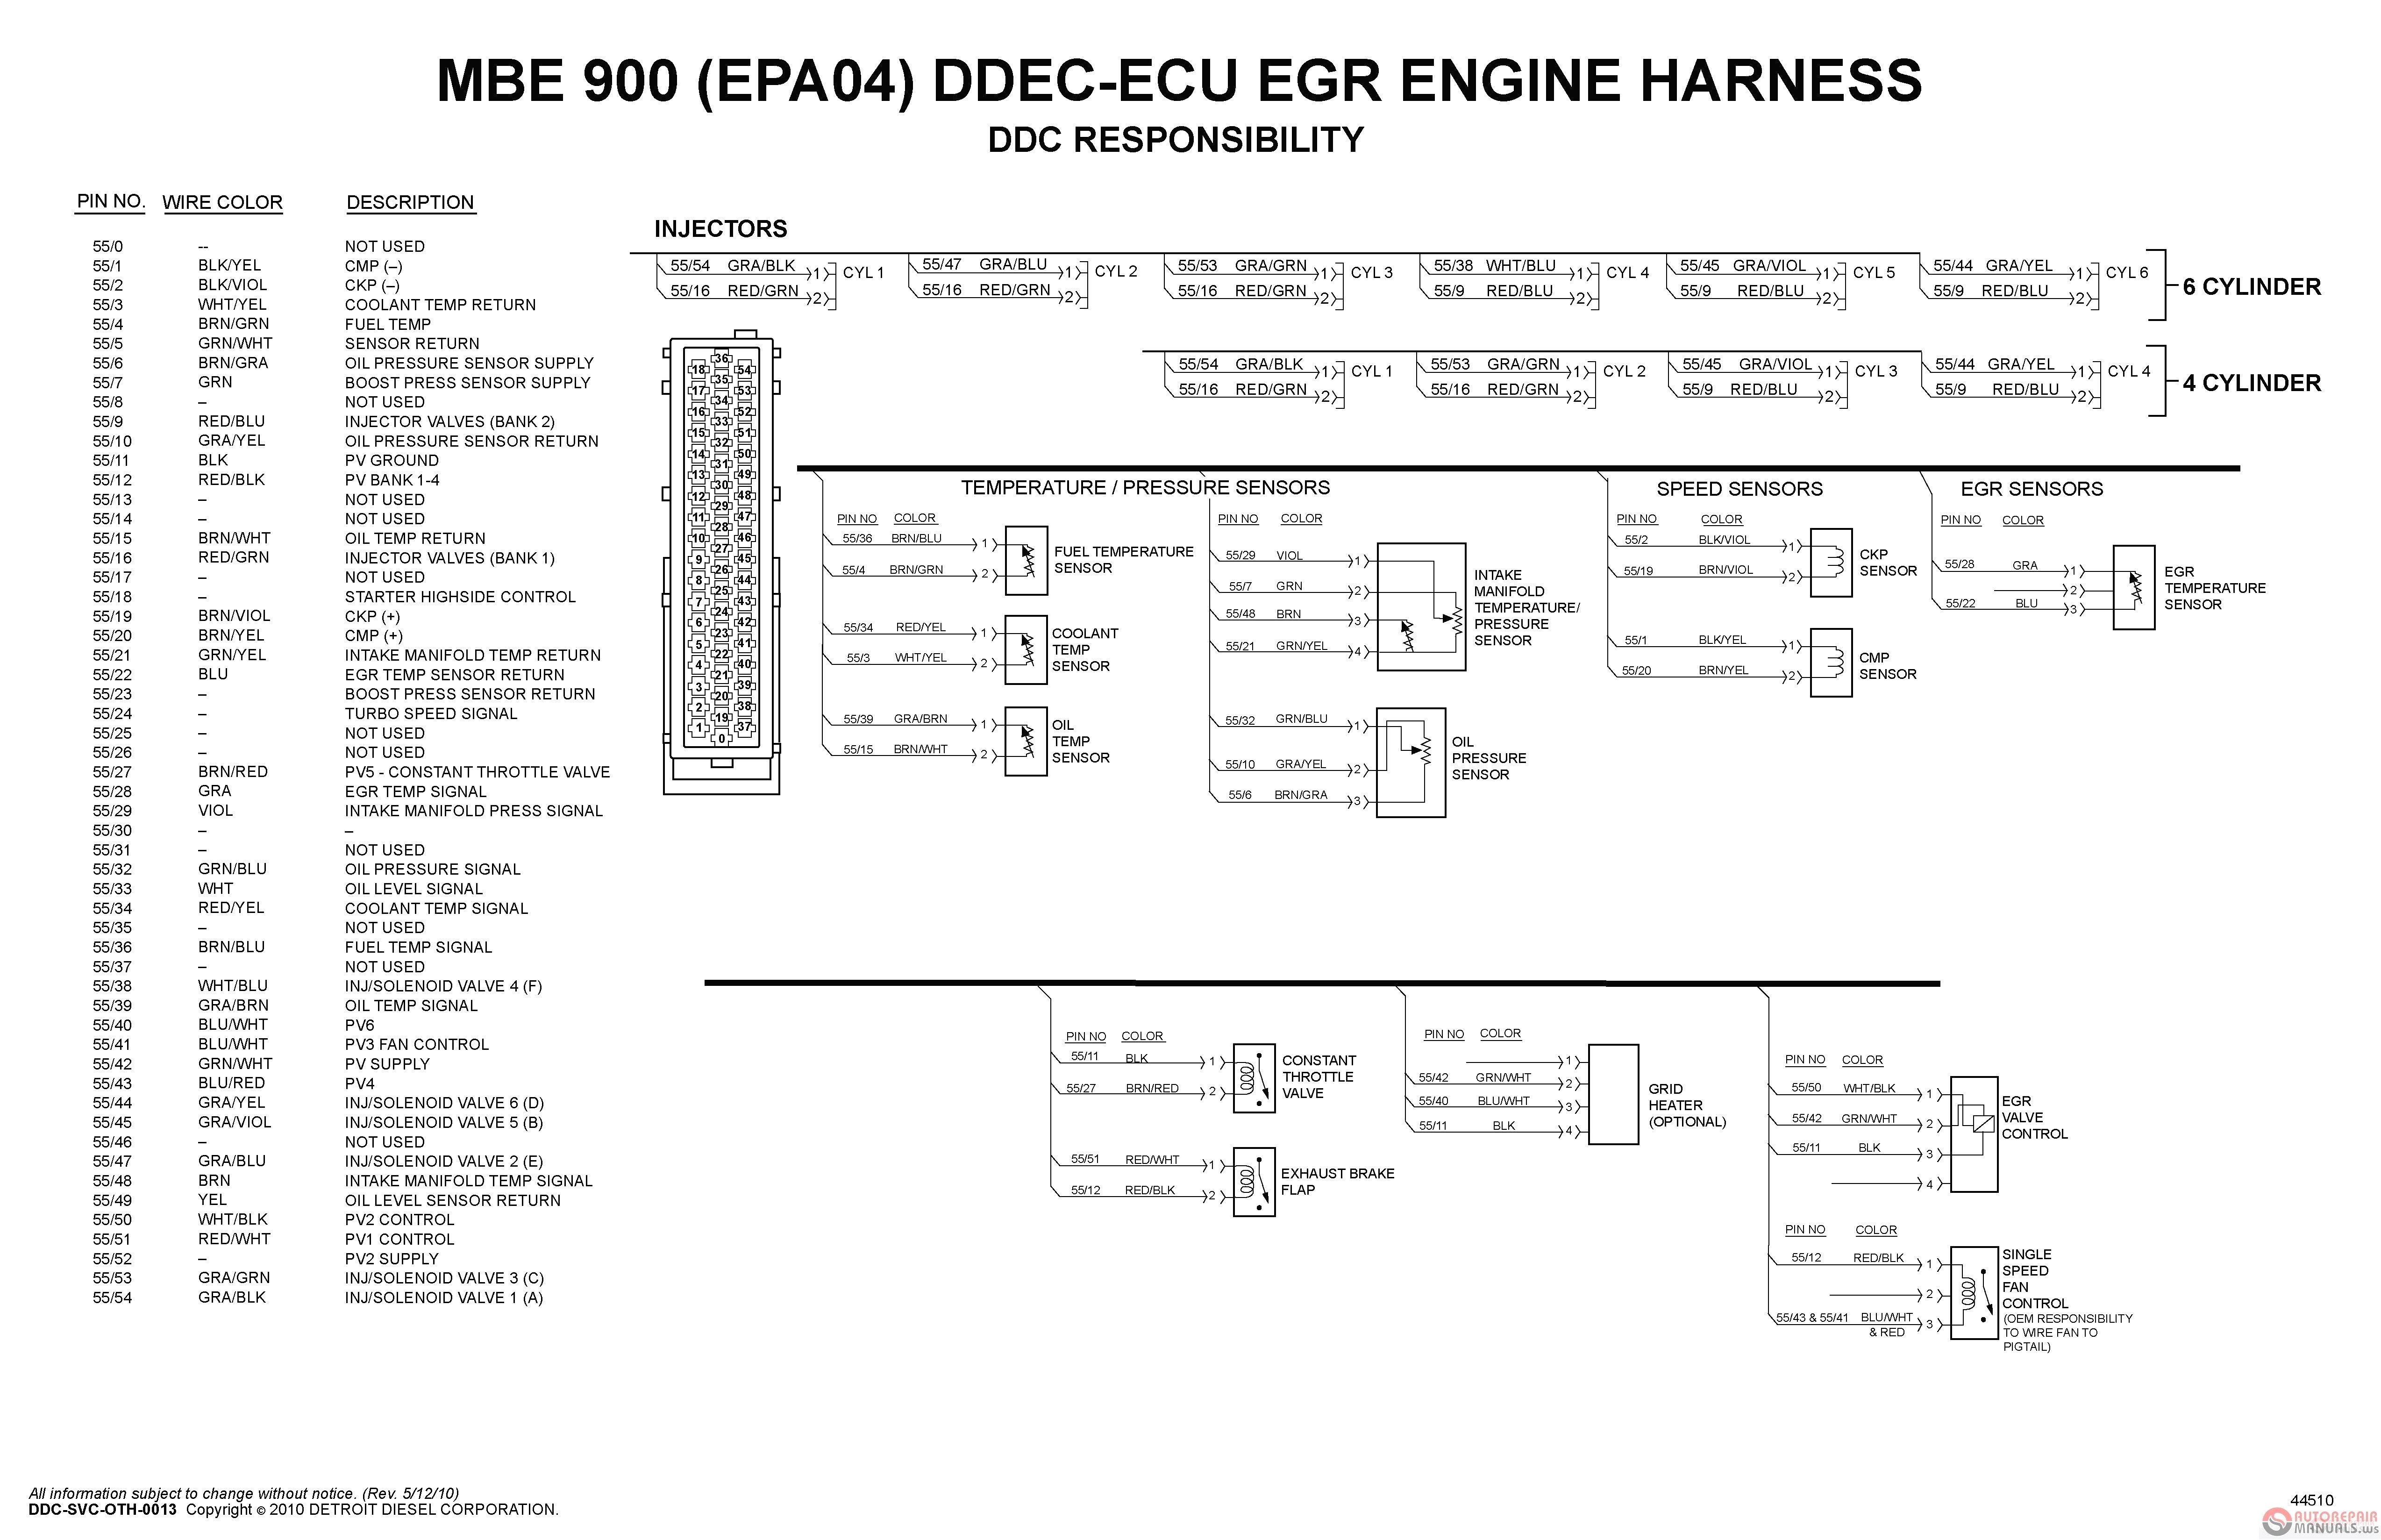 hight resolution of detroit diesel series 60 ecm wiring diagram on 1499277944 and at fordetroit diesel series 60 ecm